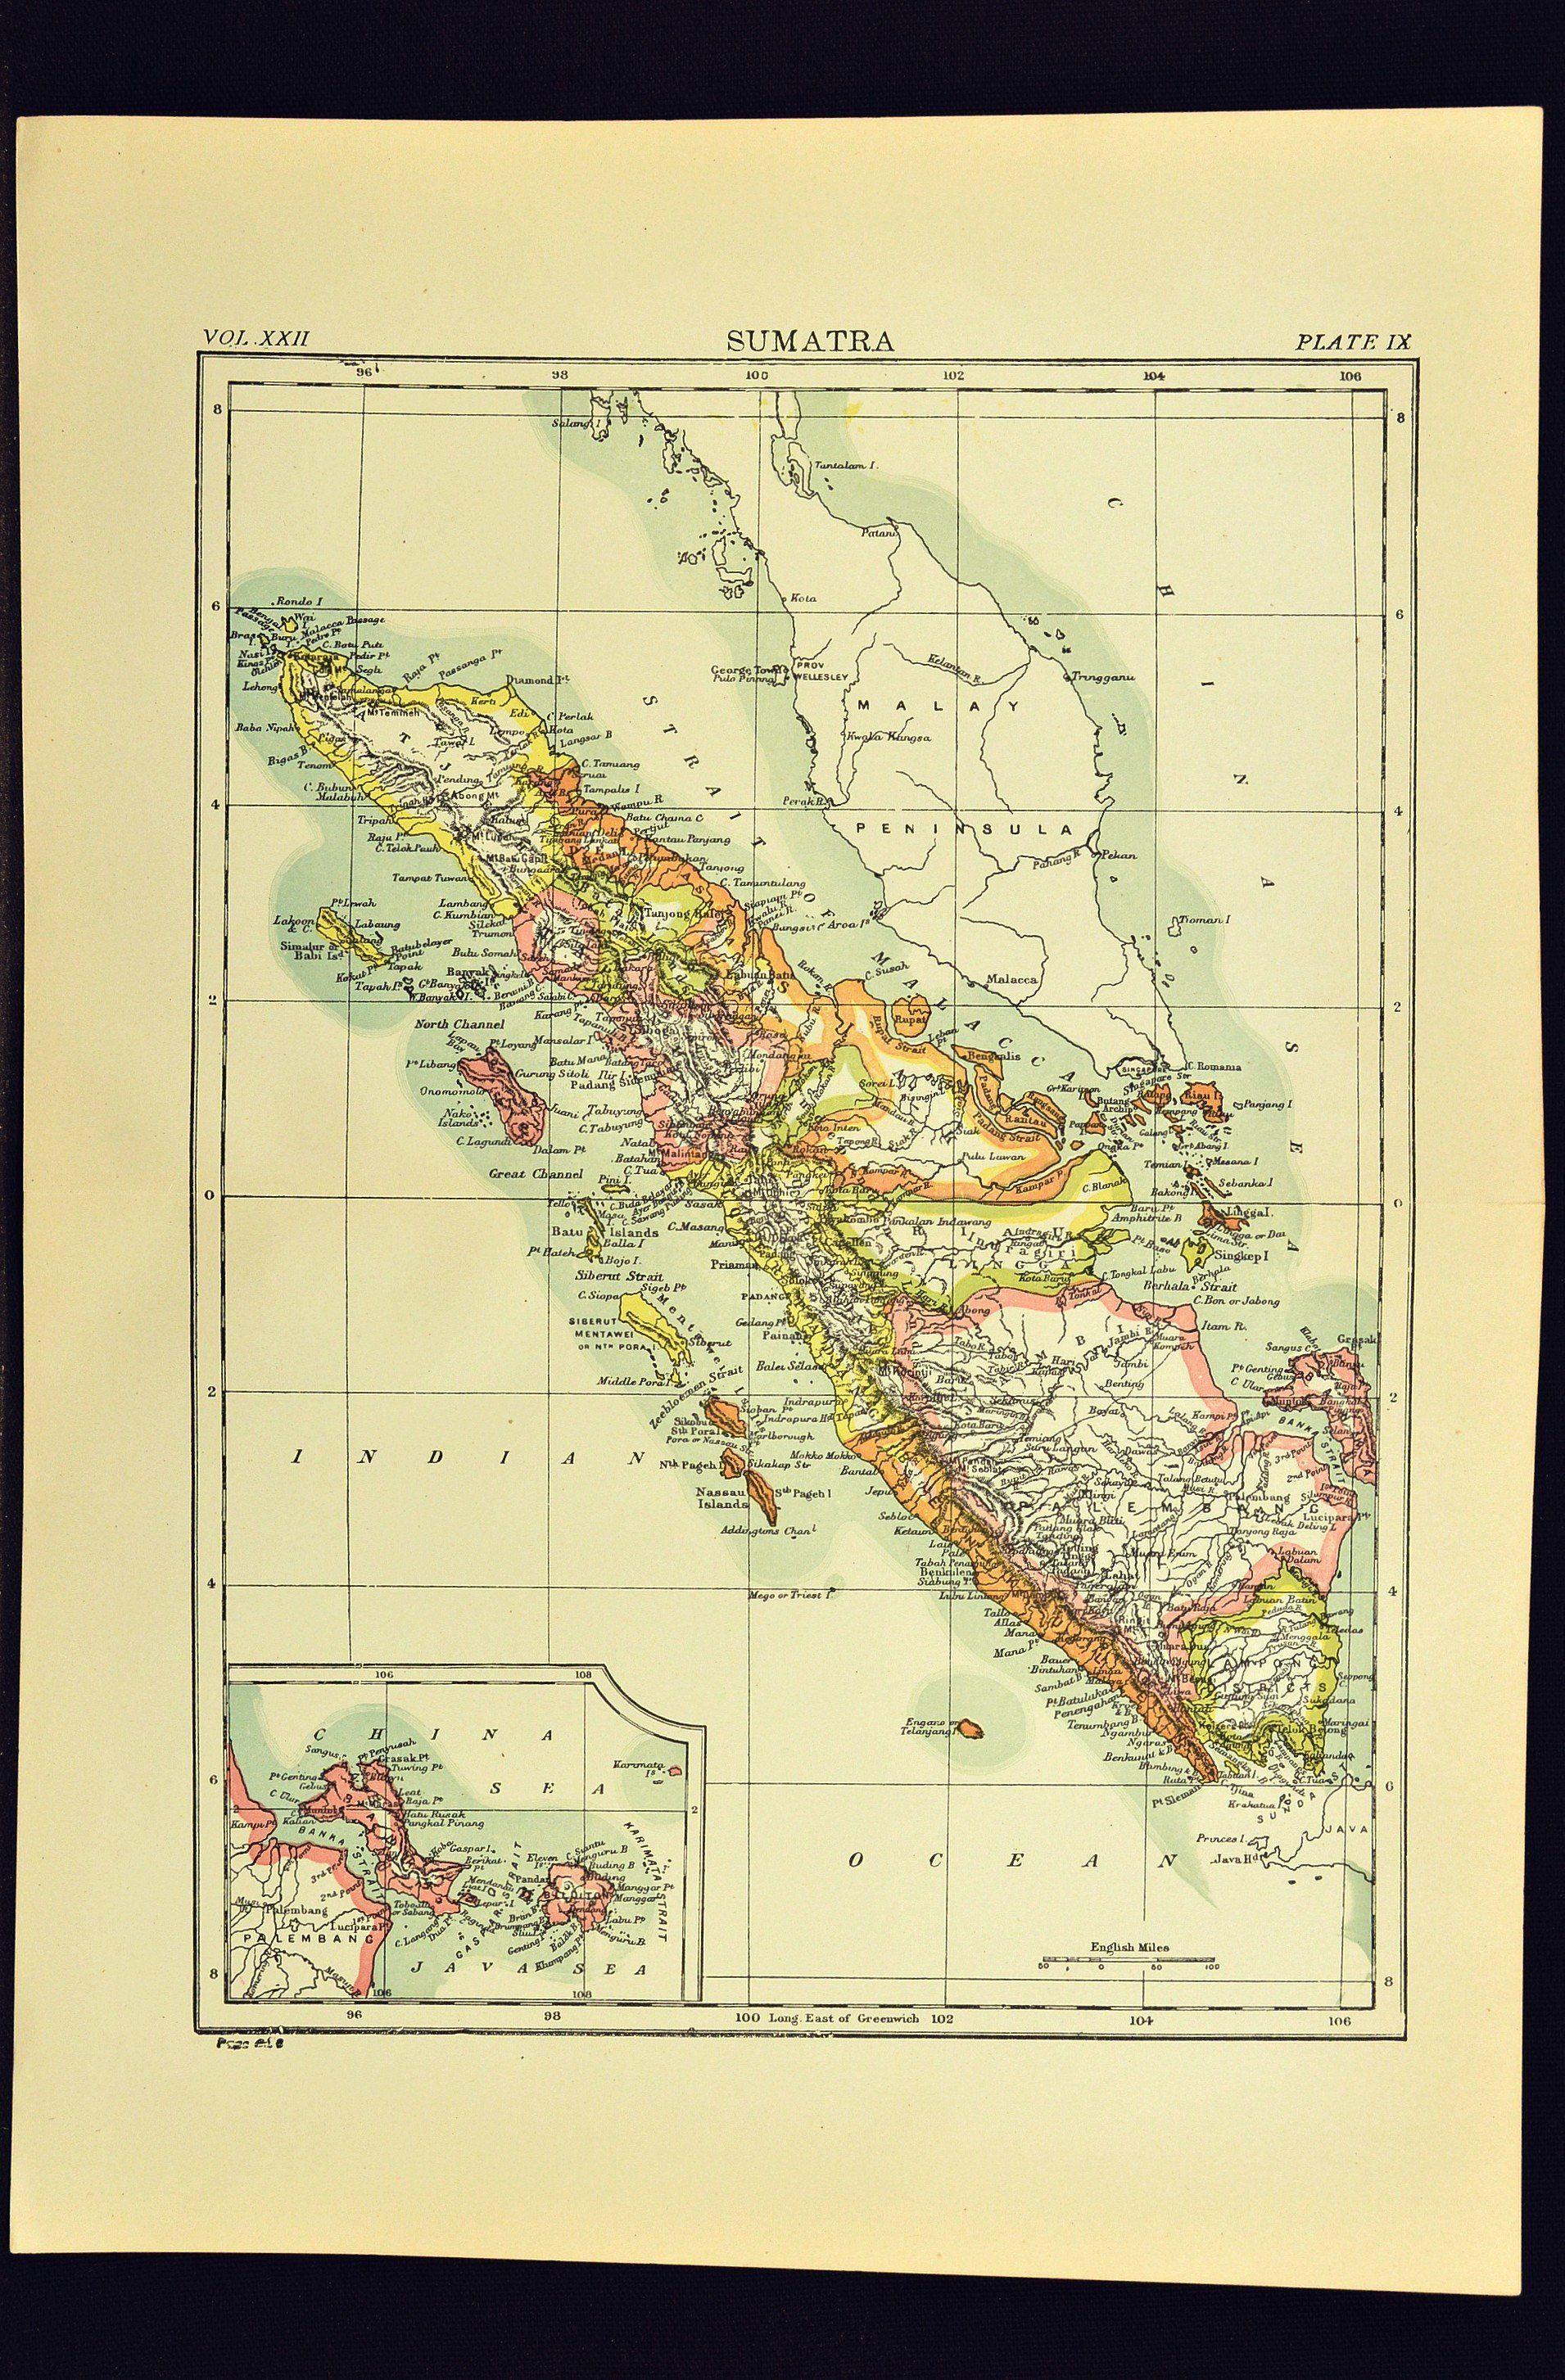 Antique Sumatra Map of Sumatra Colorful Medan Palembang West ... on hong kong map, padang map, balikpapan map, shah alam map, cebu map, borneo map, kabul map, baku map, indonesia map, bandar seri begawan map, east java map, palembang map, south jakarta map, pekanbaru map, rio de janeiro map, recife map, natal map, mandalay map, yogyakarta map, semarang map,